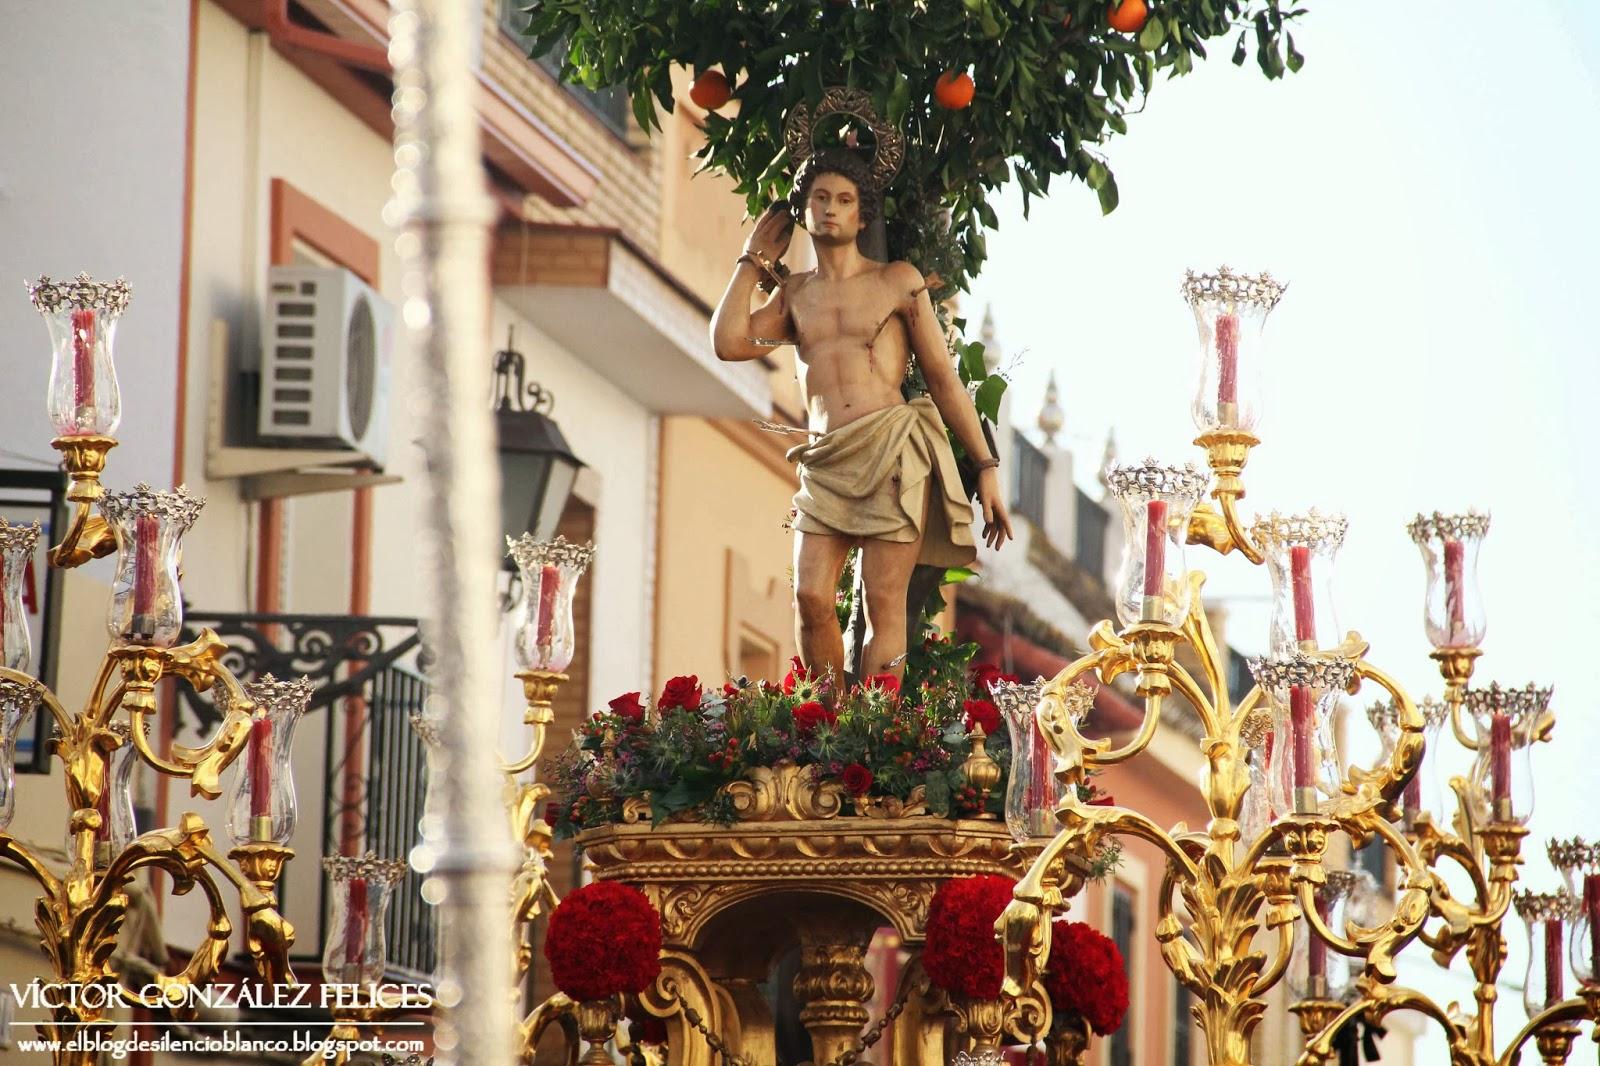 San Sebastian de Tomares, 2014